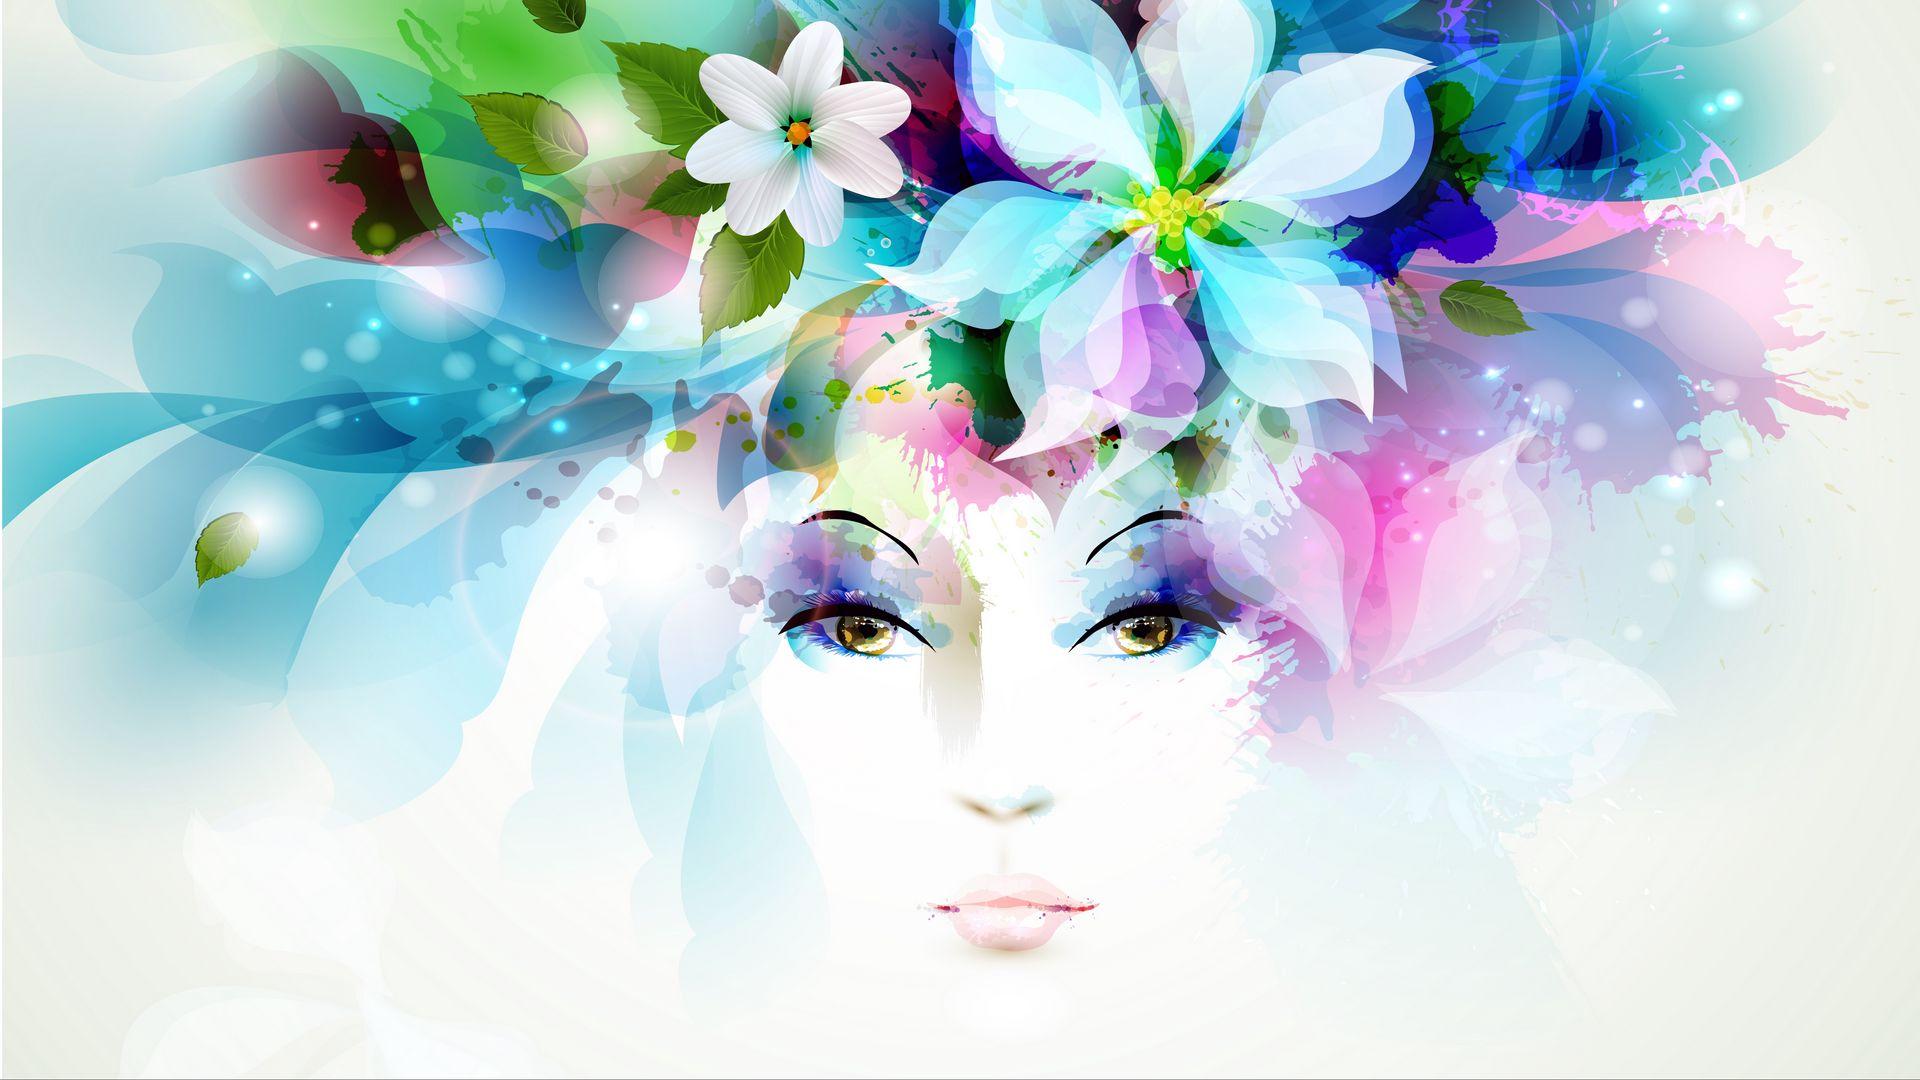 1920x1080 Wallpaper art, girl, eyes, flowers, petals, butterfly, leaves, spray